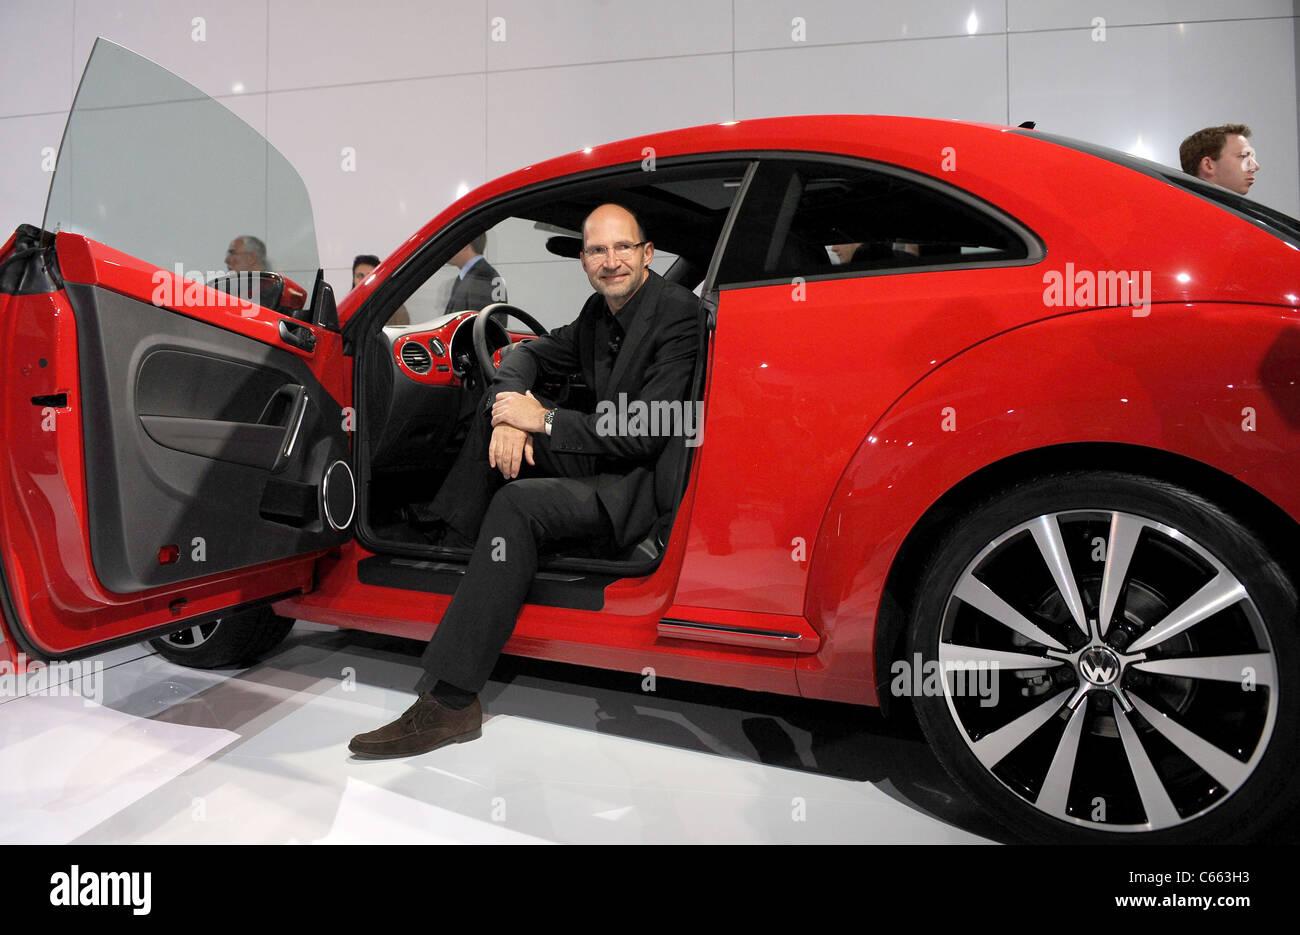 21 Century Auto >> Volkswagen Unveils 21st Century Vw Beetle Automobile Stock